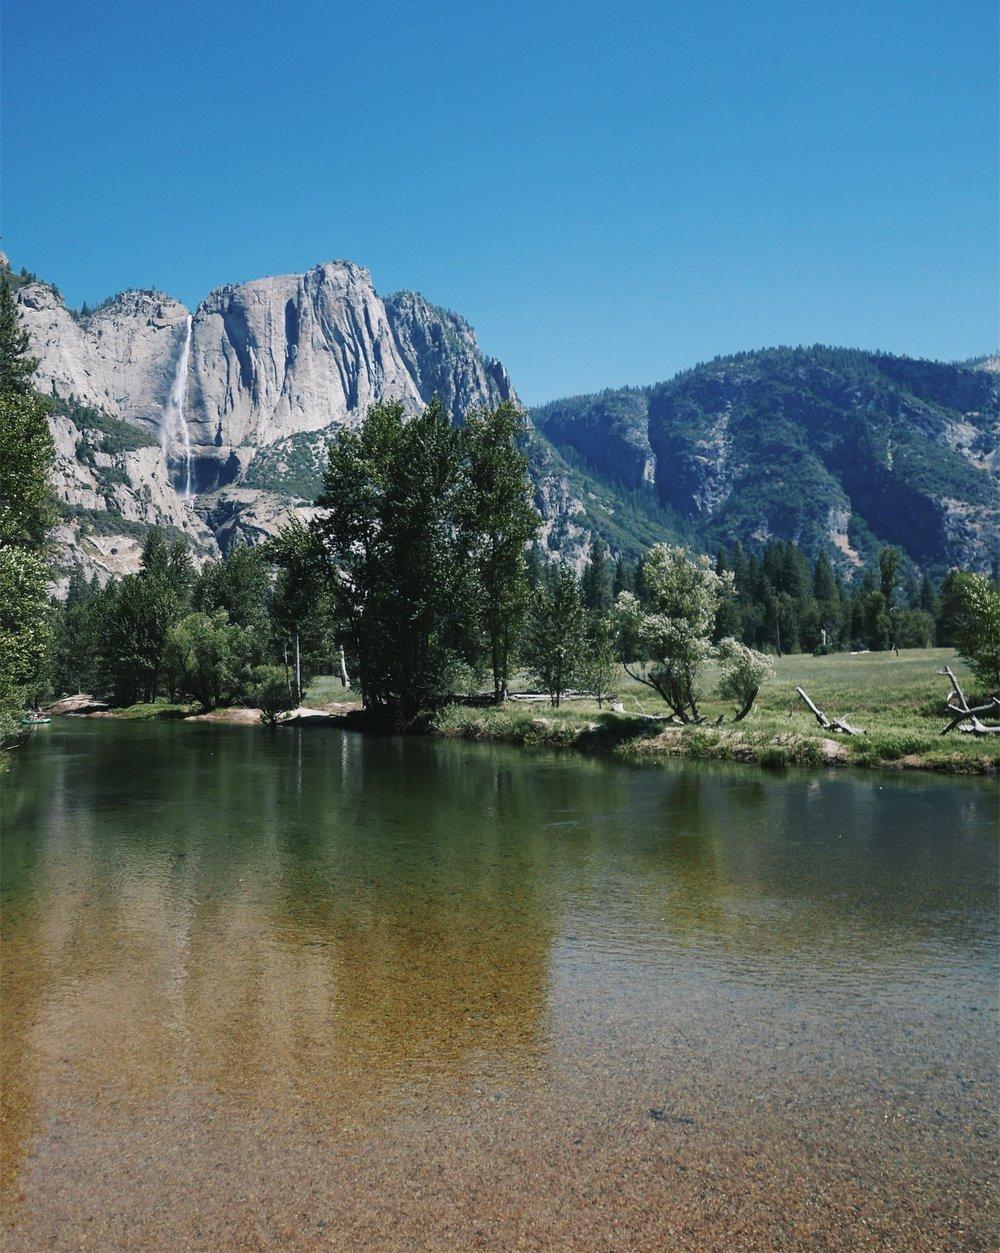 Yosemite, CA pt. 2